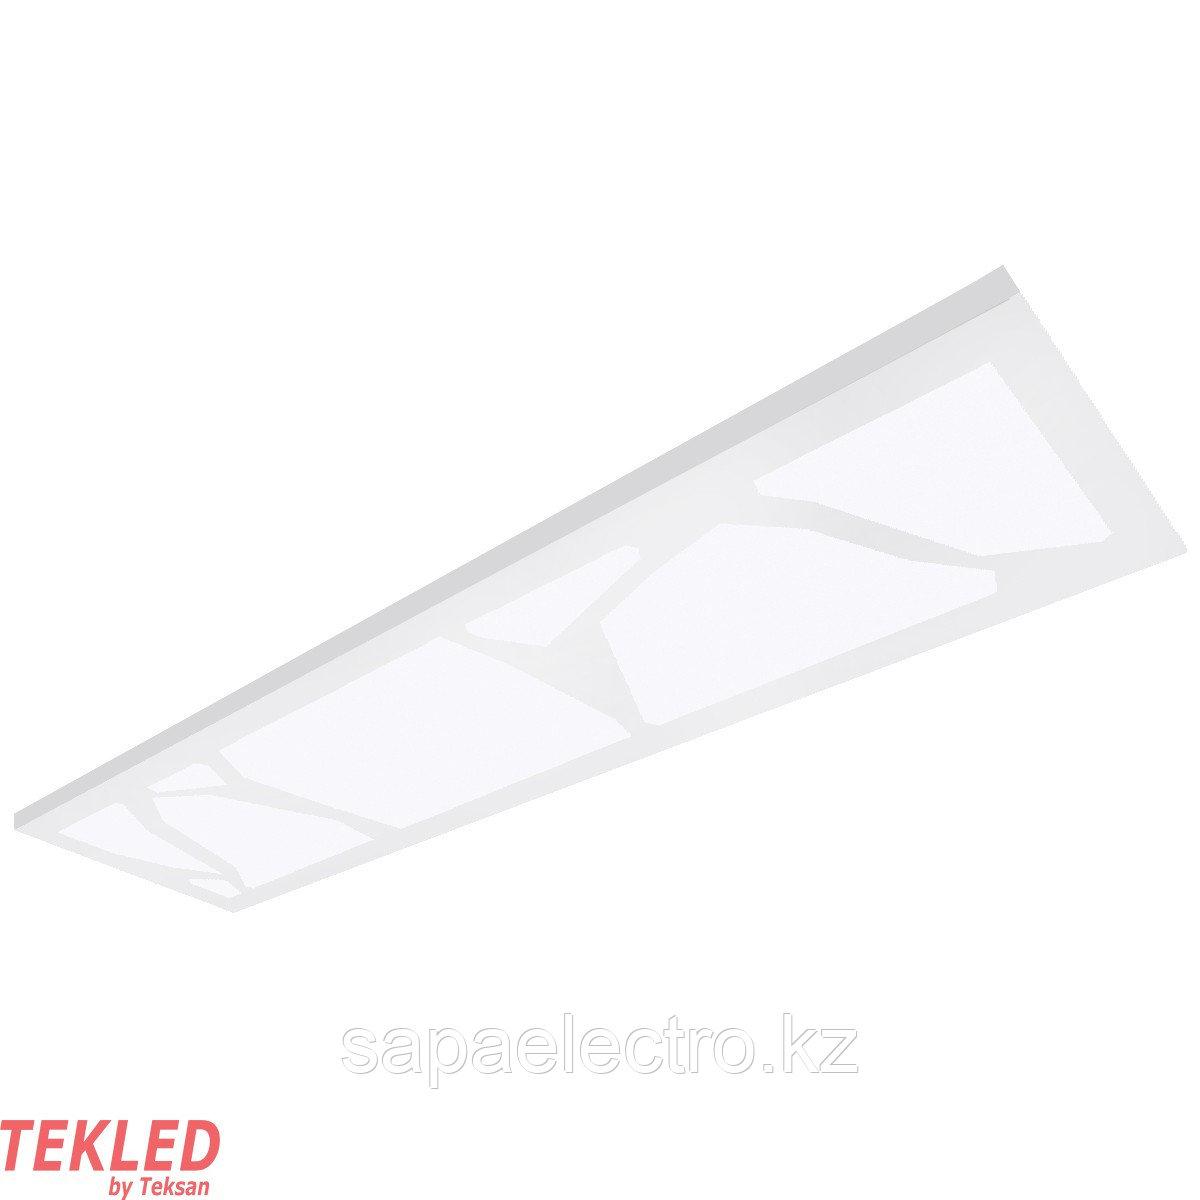 Св-к  OPALLED MARBLE 48W WH S/U  1200x300 3000K MGL